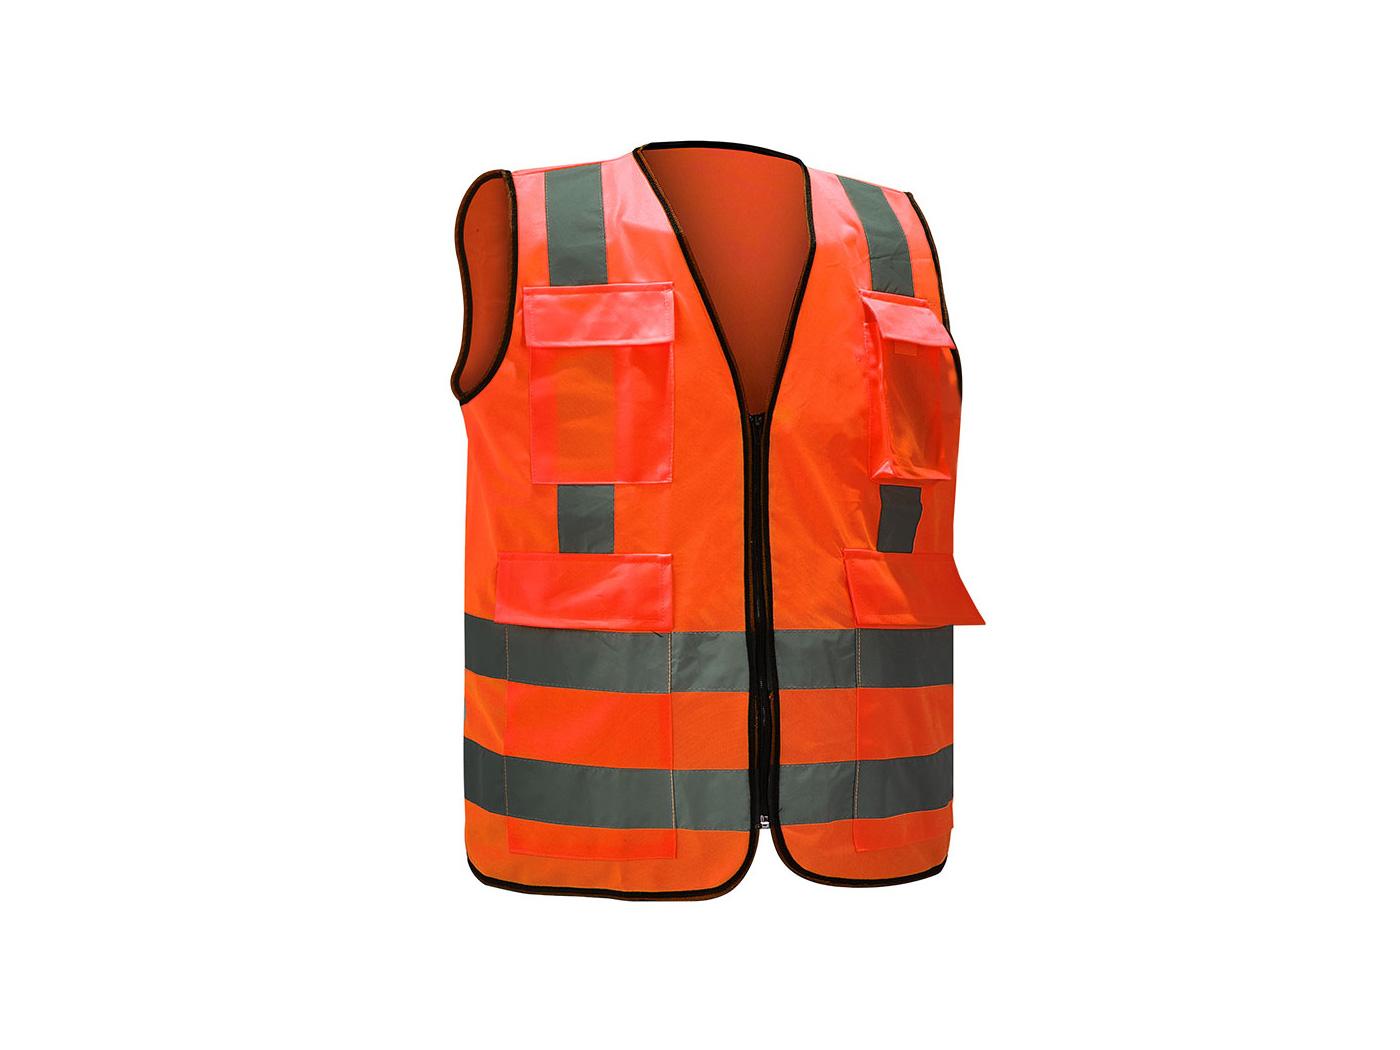 Vest Bright Supplier in Abu dhabi